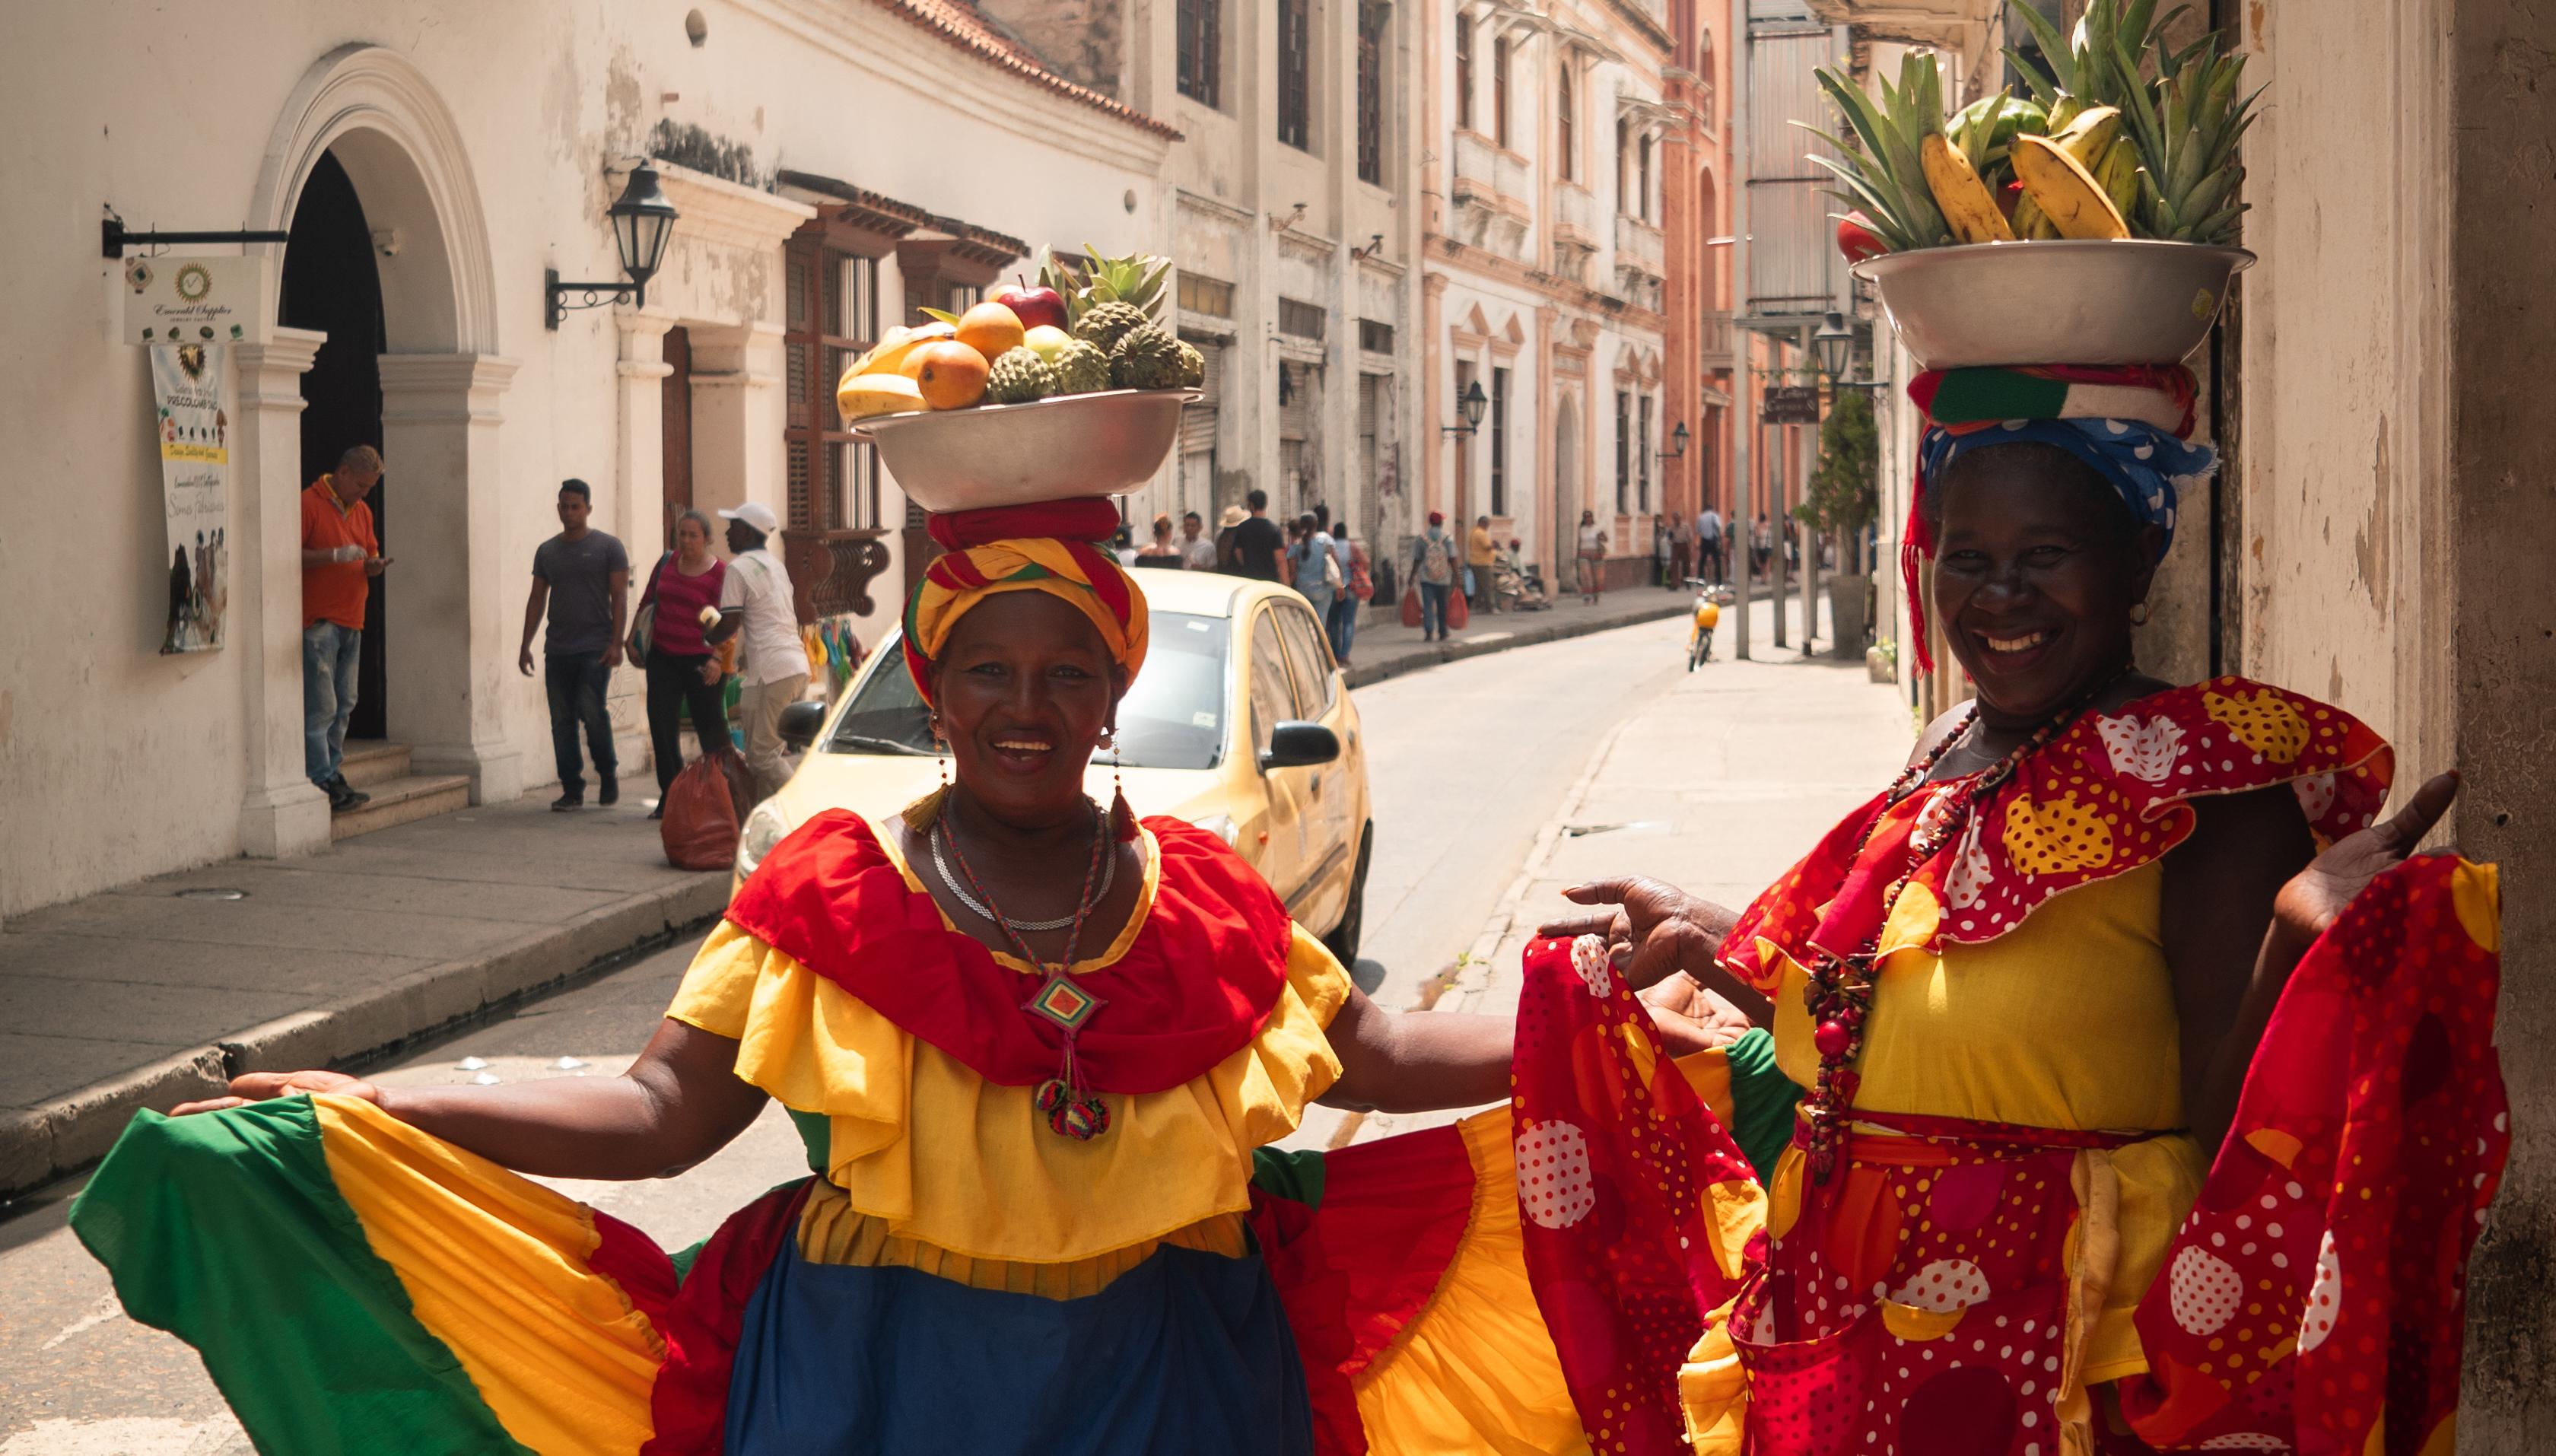 Lustrumreis Colombia Cartagena1 123